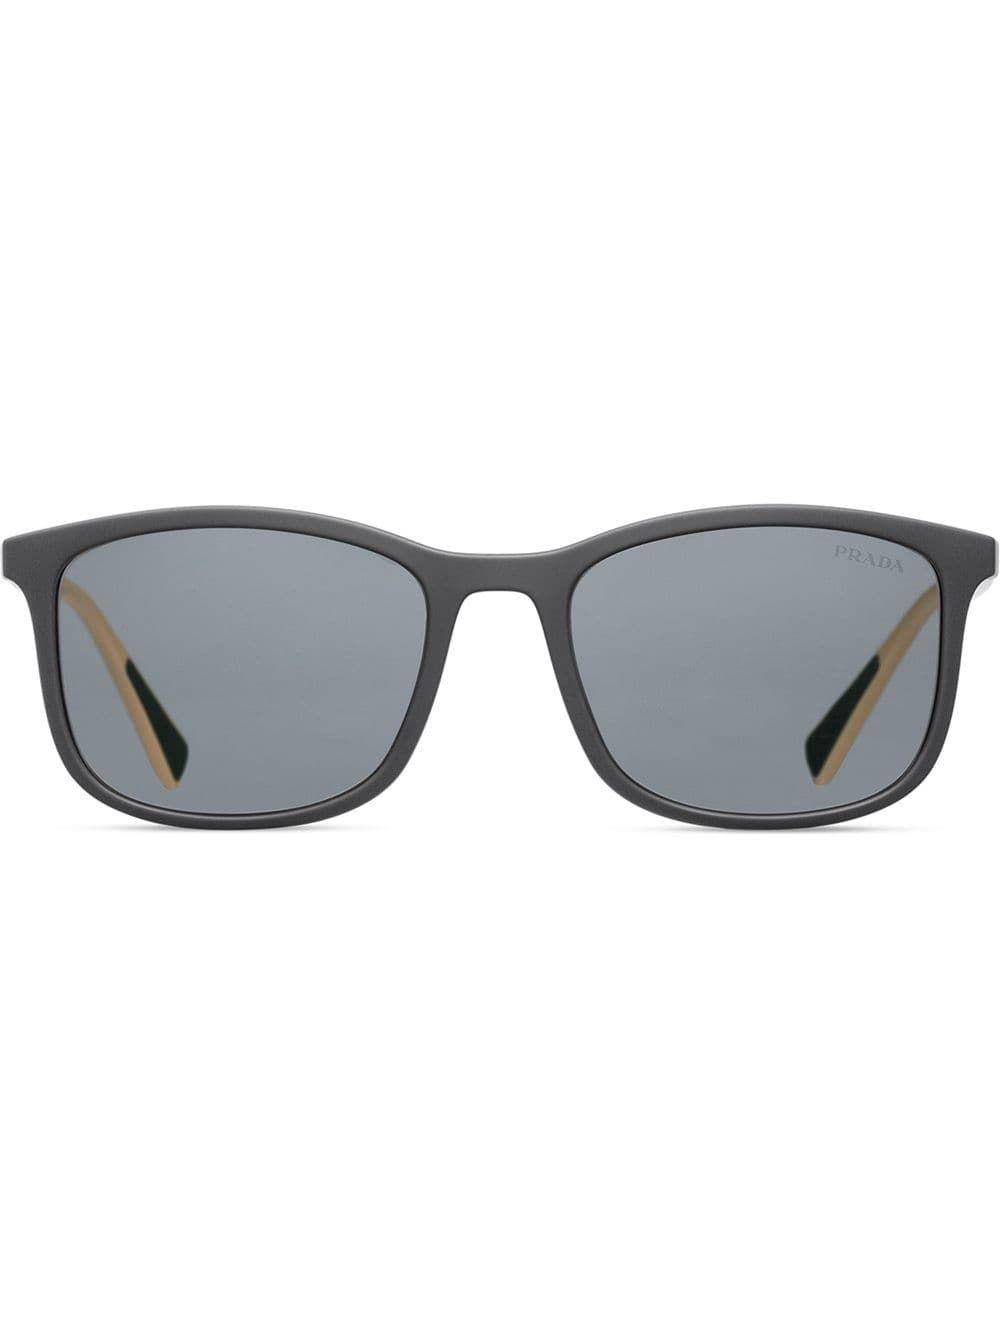 7a50a2d967 Robert la Roche sunglasses - Elsnegg RLR917S in honey tortoise ...